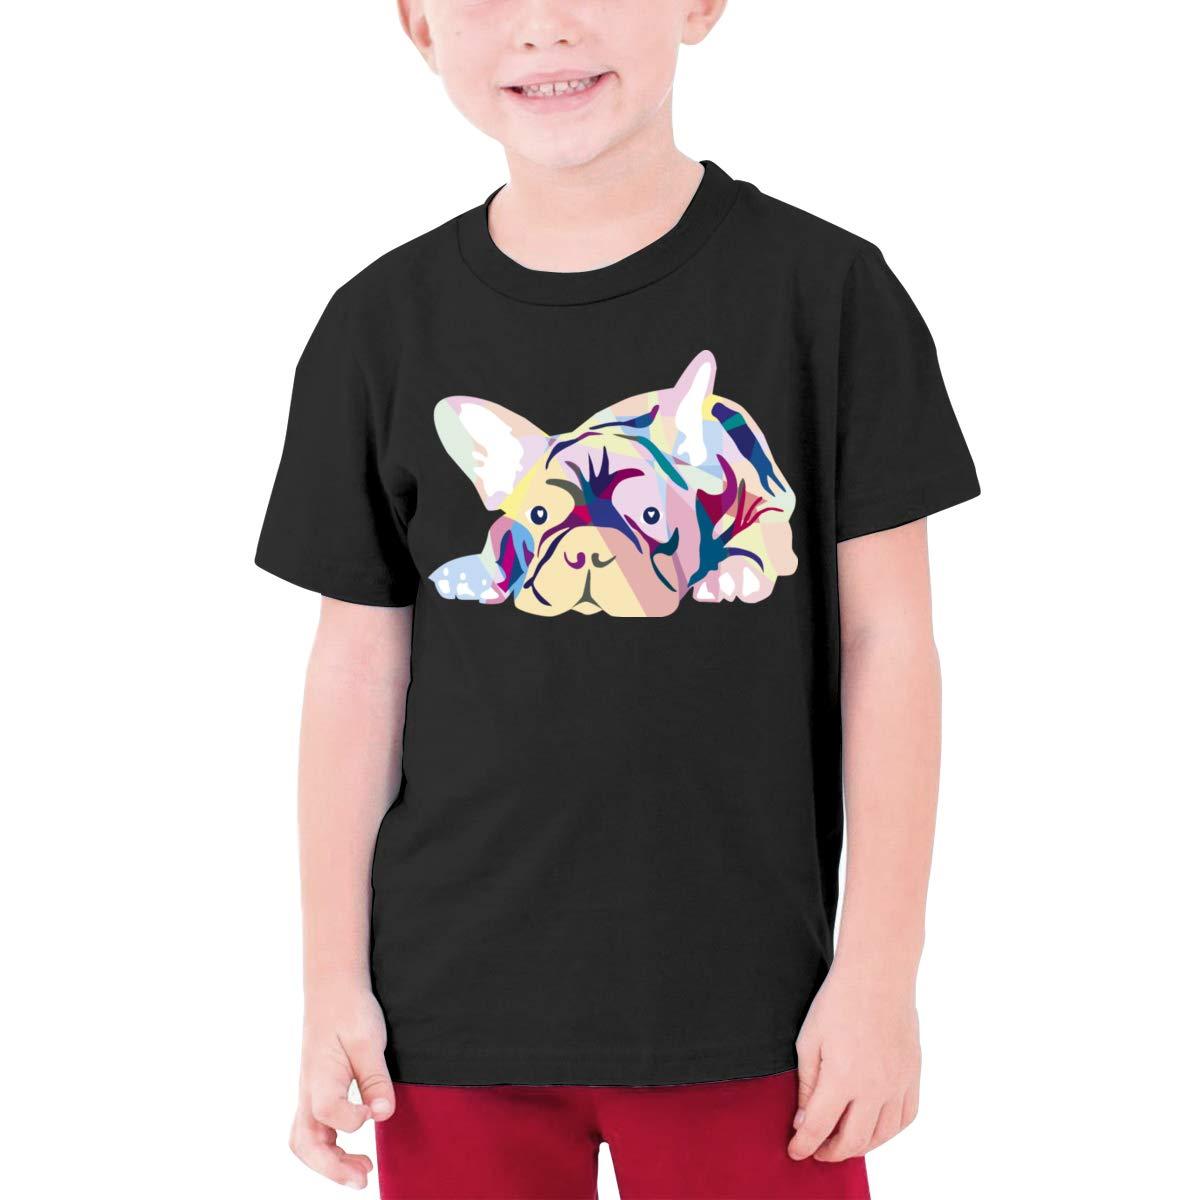 Fzjy Wnx Pink French Bulldog Boys Short Sleeve Shirts